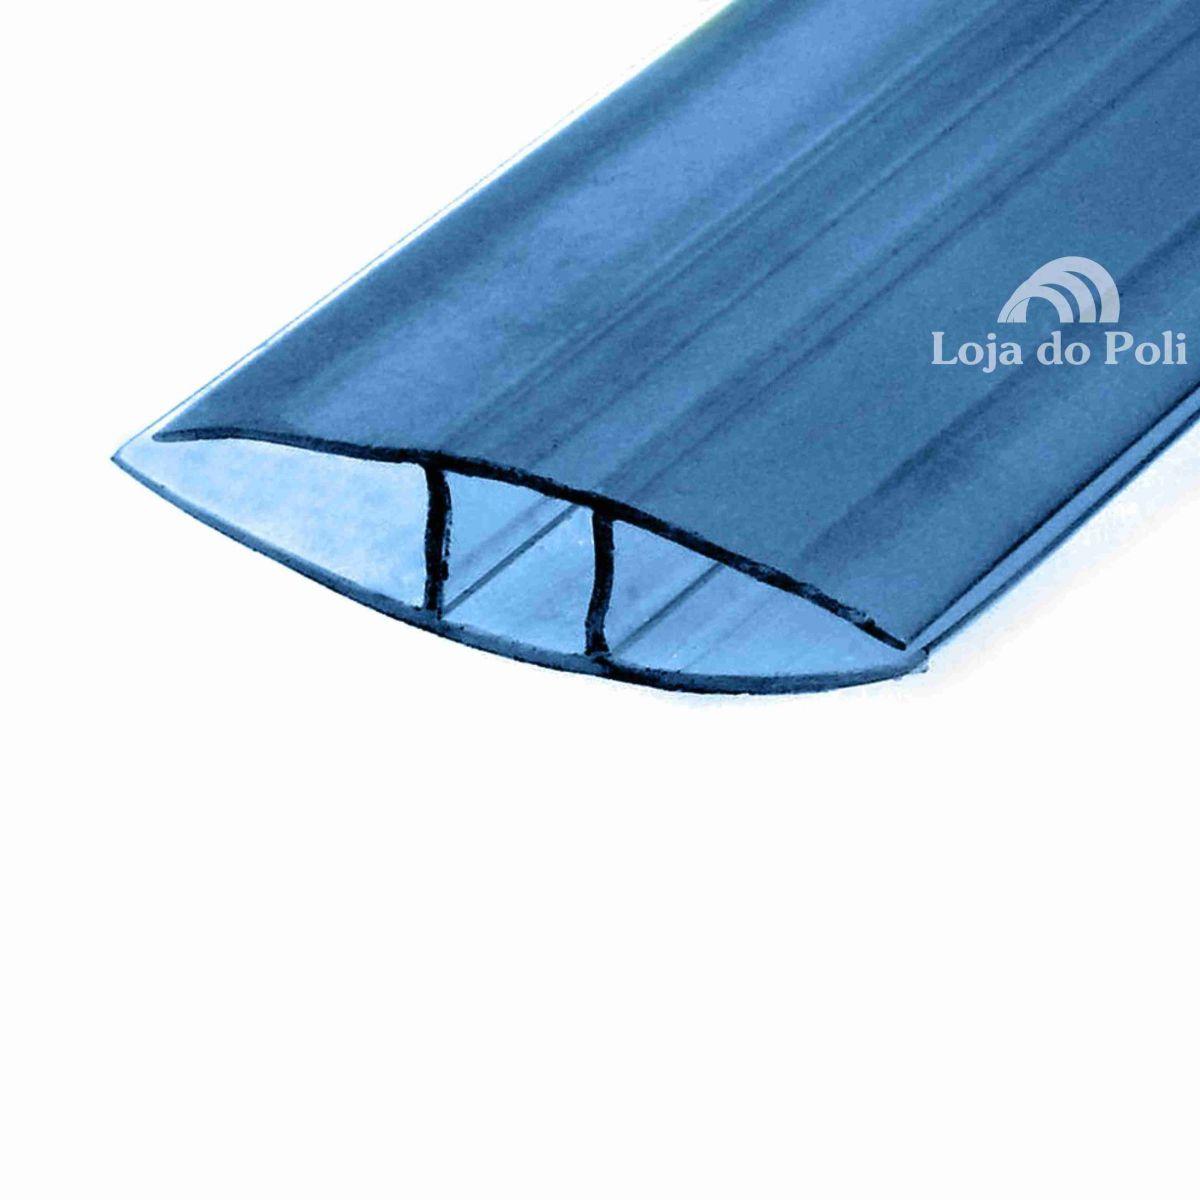 Emenda Rápida Azul Para Policarbonato 4 / 6 ou 10mm - 6 Metros